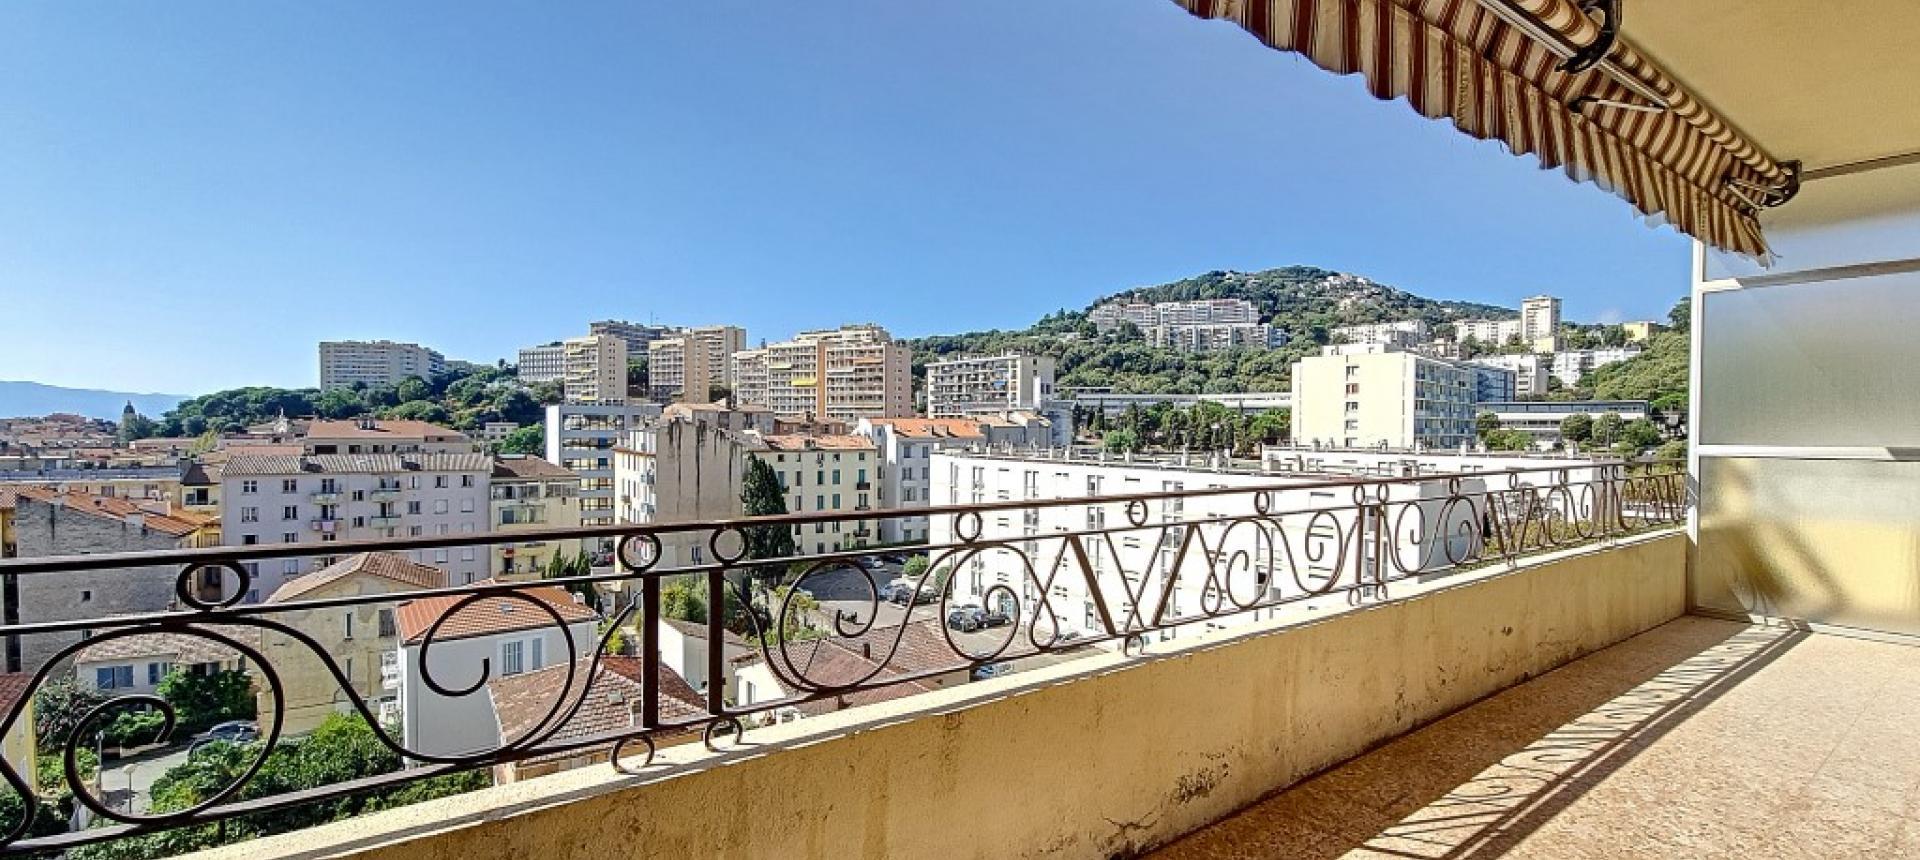 F3 à louer immeuble Masseria terrasse séjour